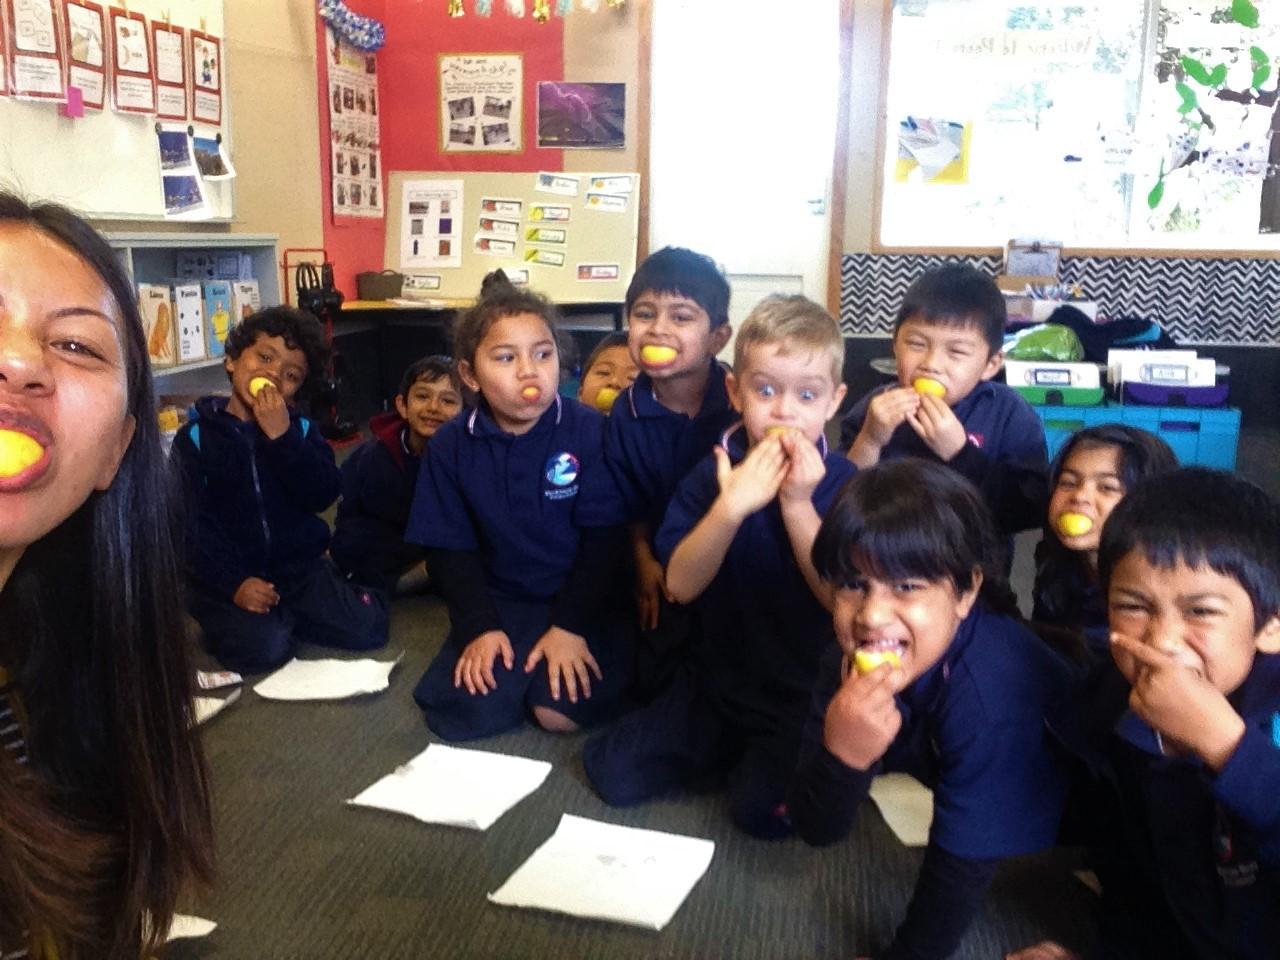 Blockhouse Bay Primary School - Super Sour Lemons!